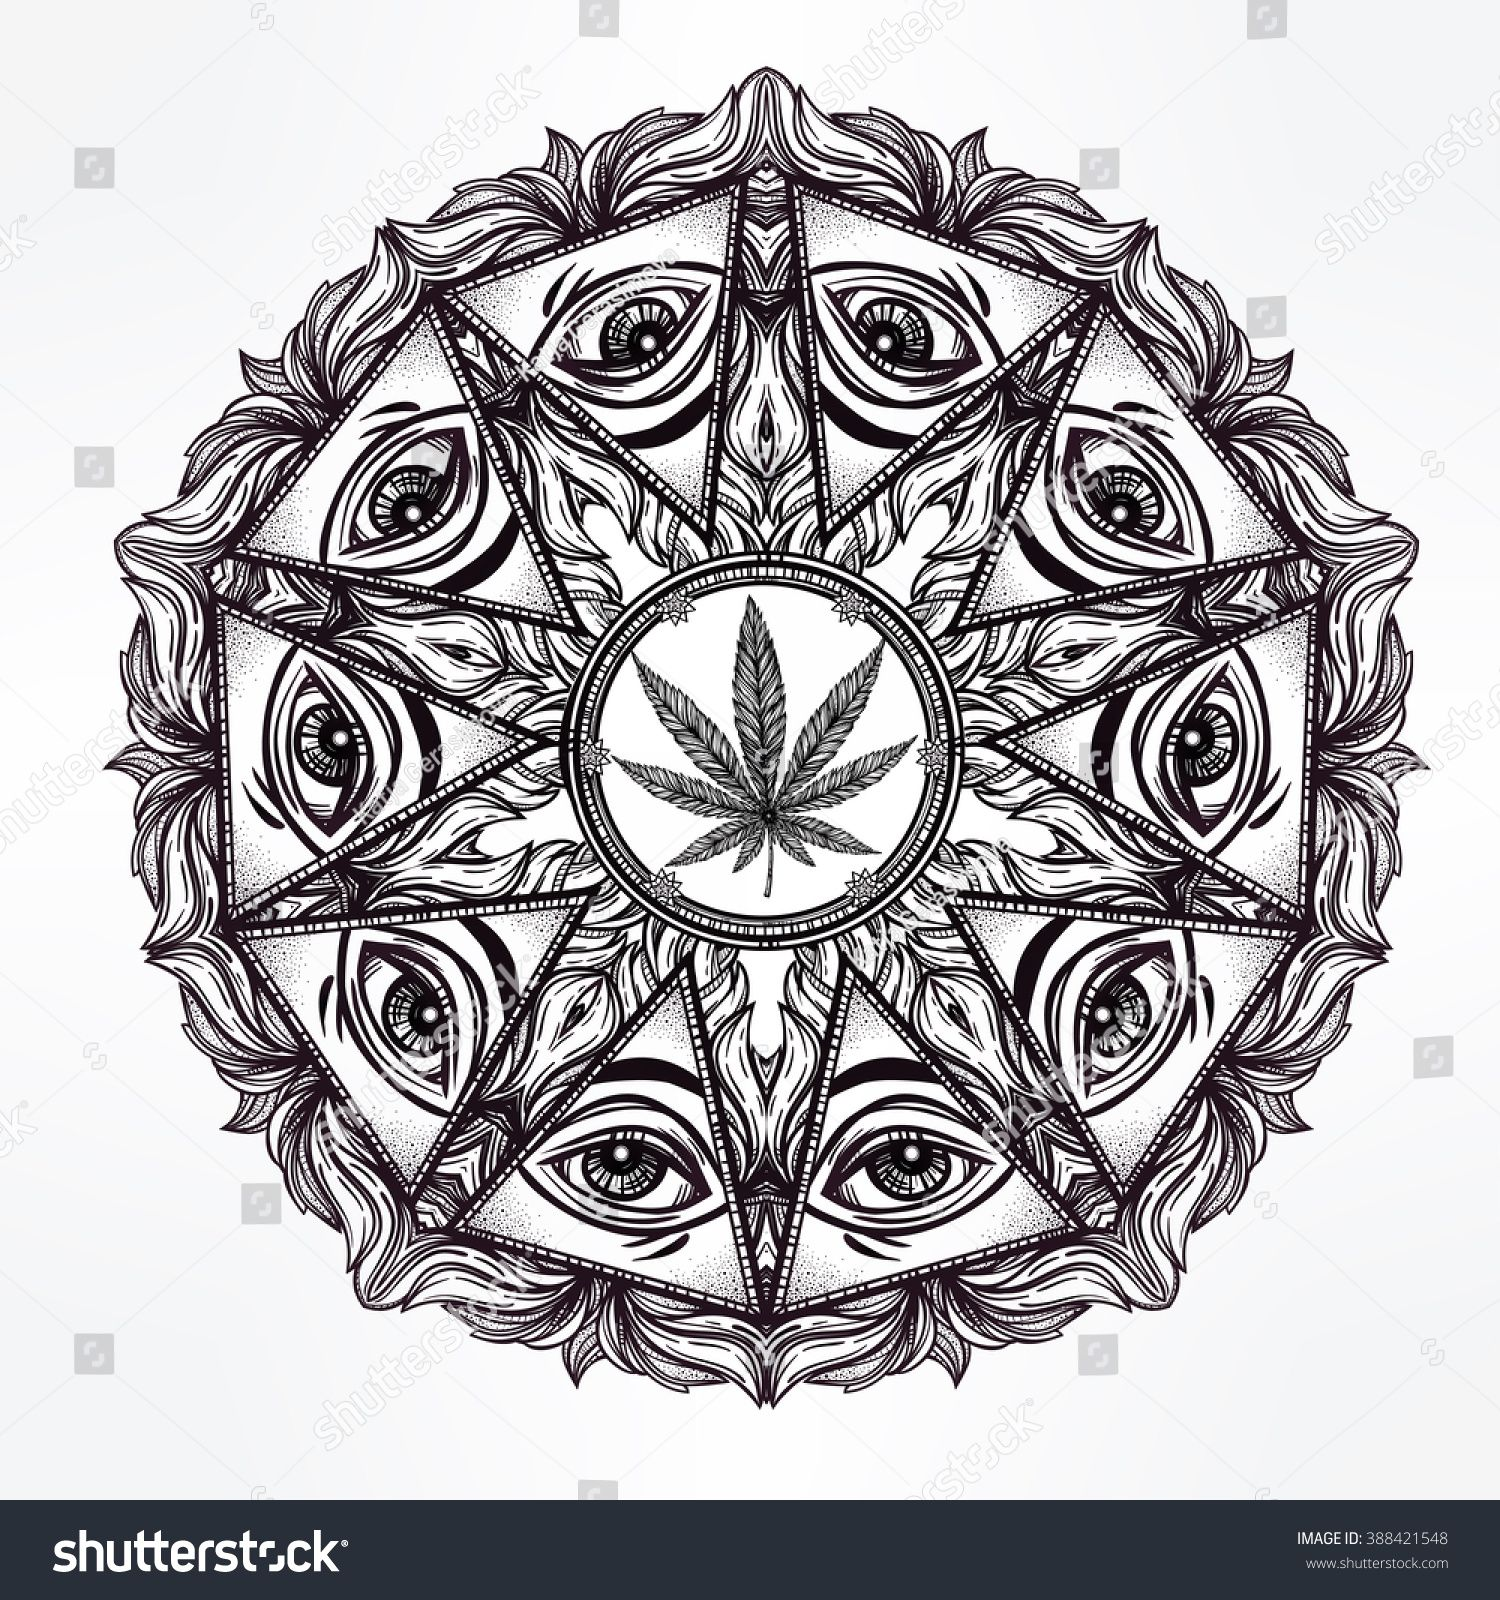 Cannabis trip mandala symbol. Tattoo design. Vintage hand drawn ...